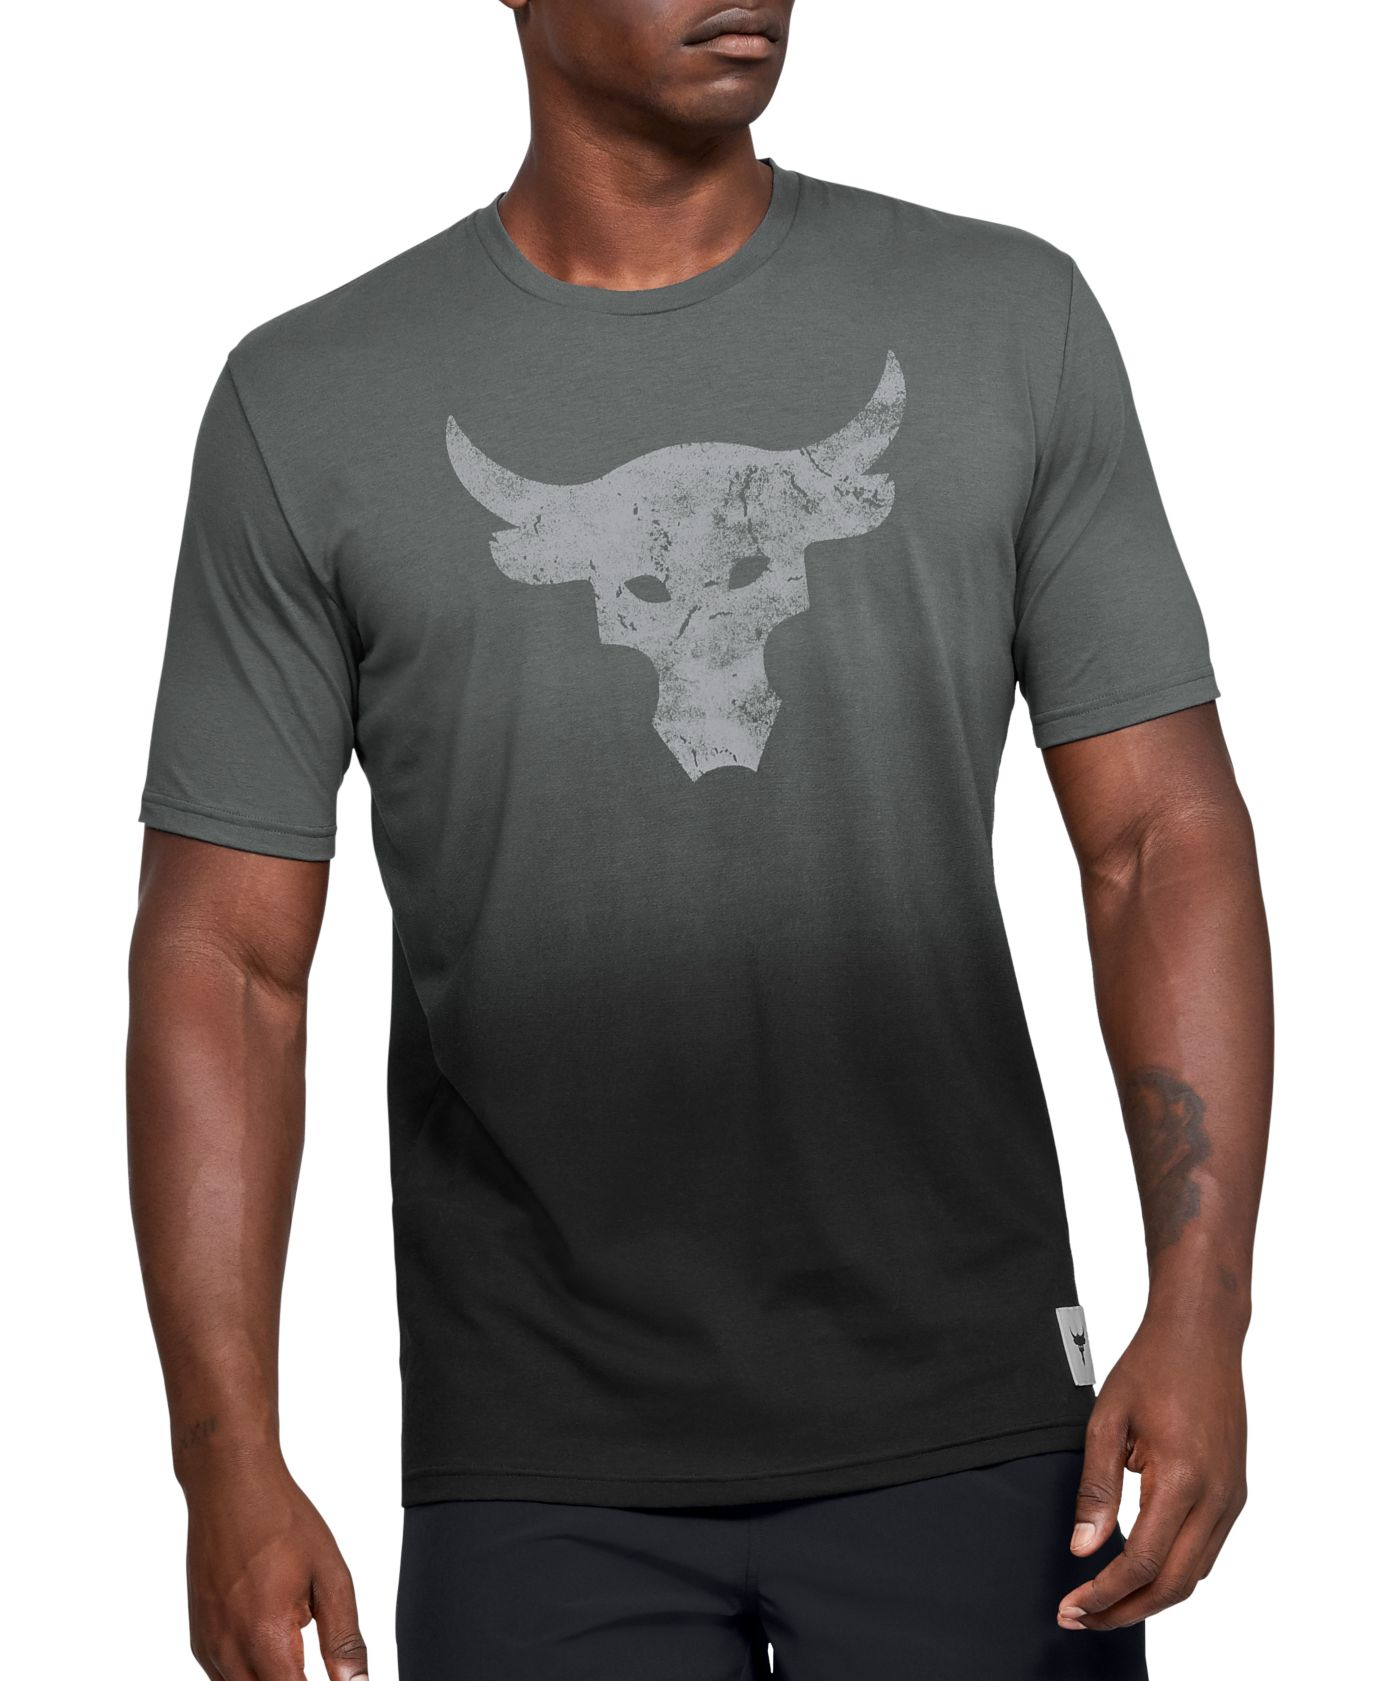 Under Armour Men's Project Rock Brahma Bull Graphic T-Shirt